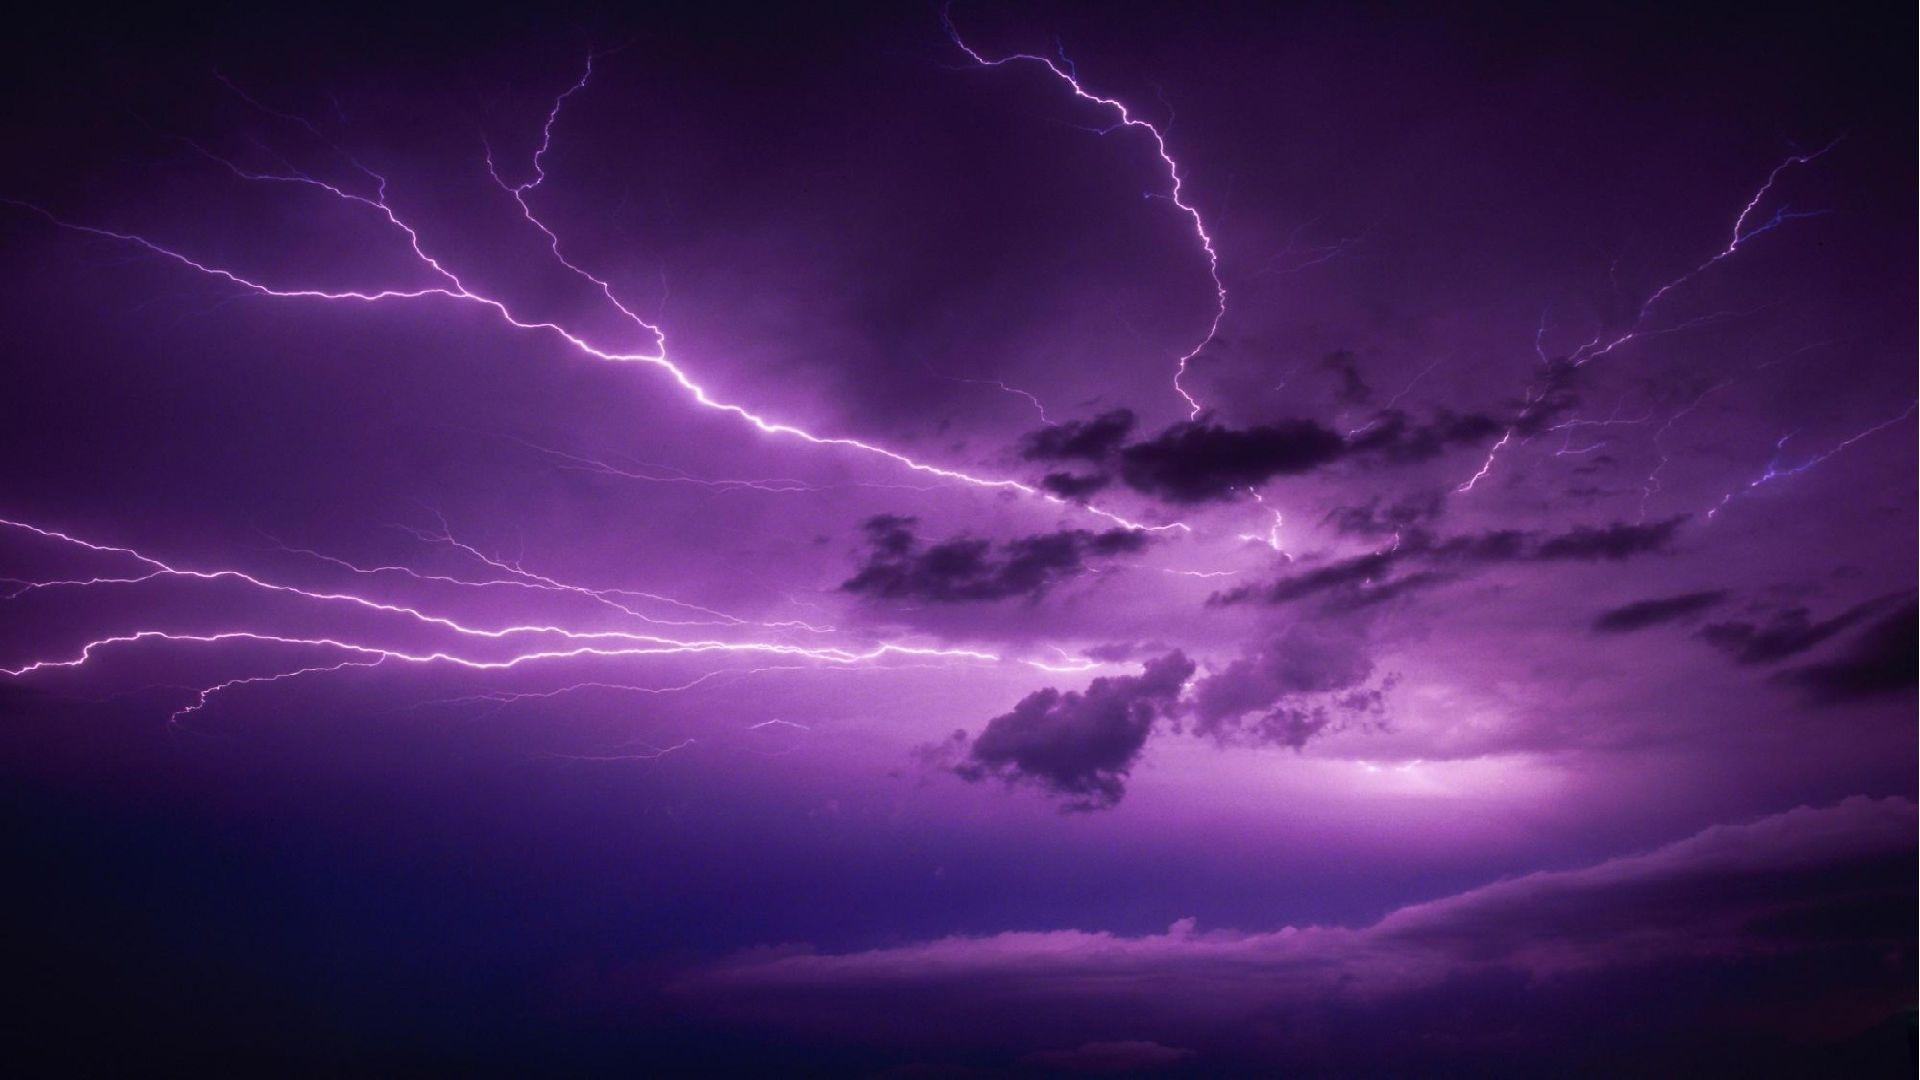 Giant Storm Desktop Sky Wallpaper Hd Phone Wallpapers Wallkocom